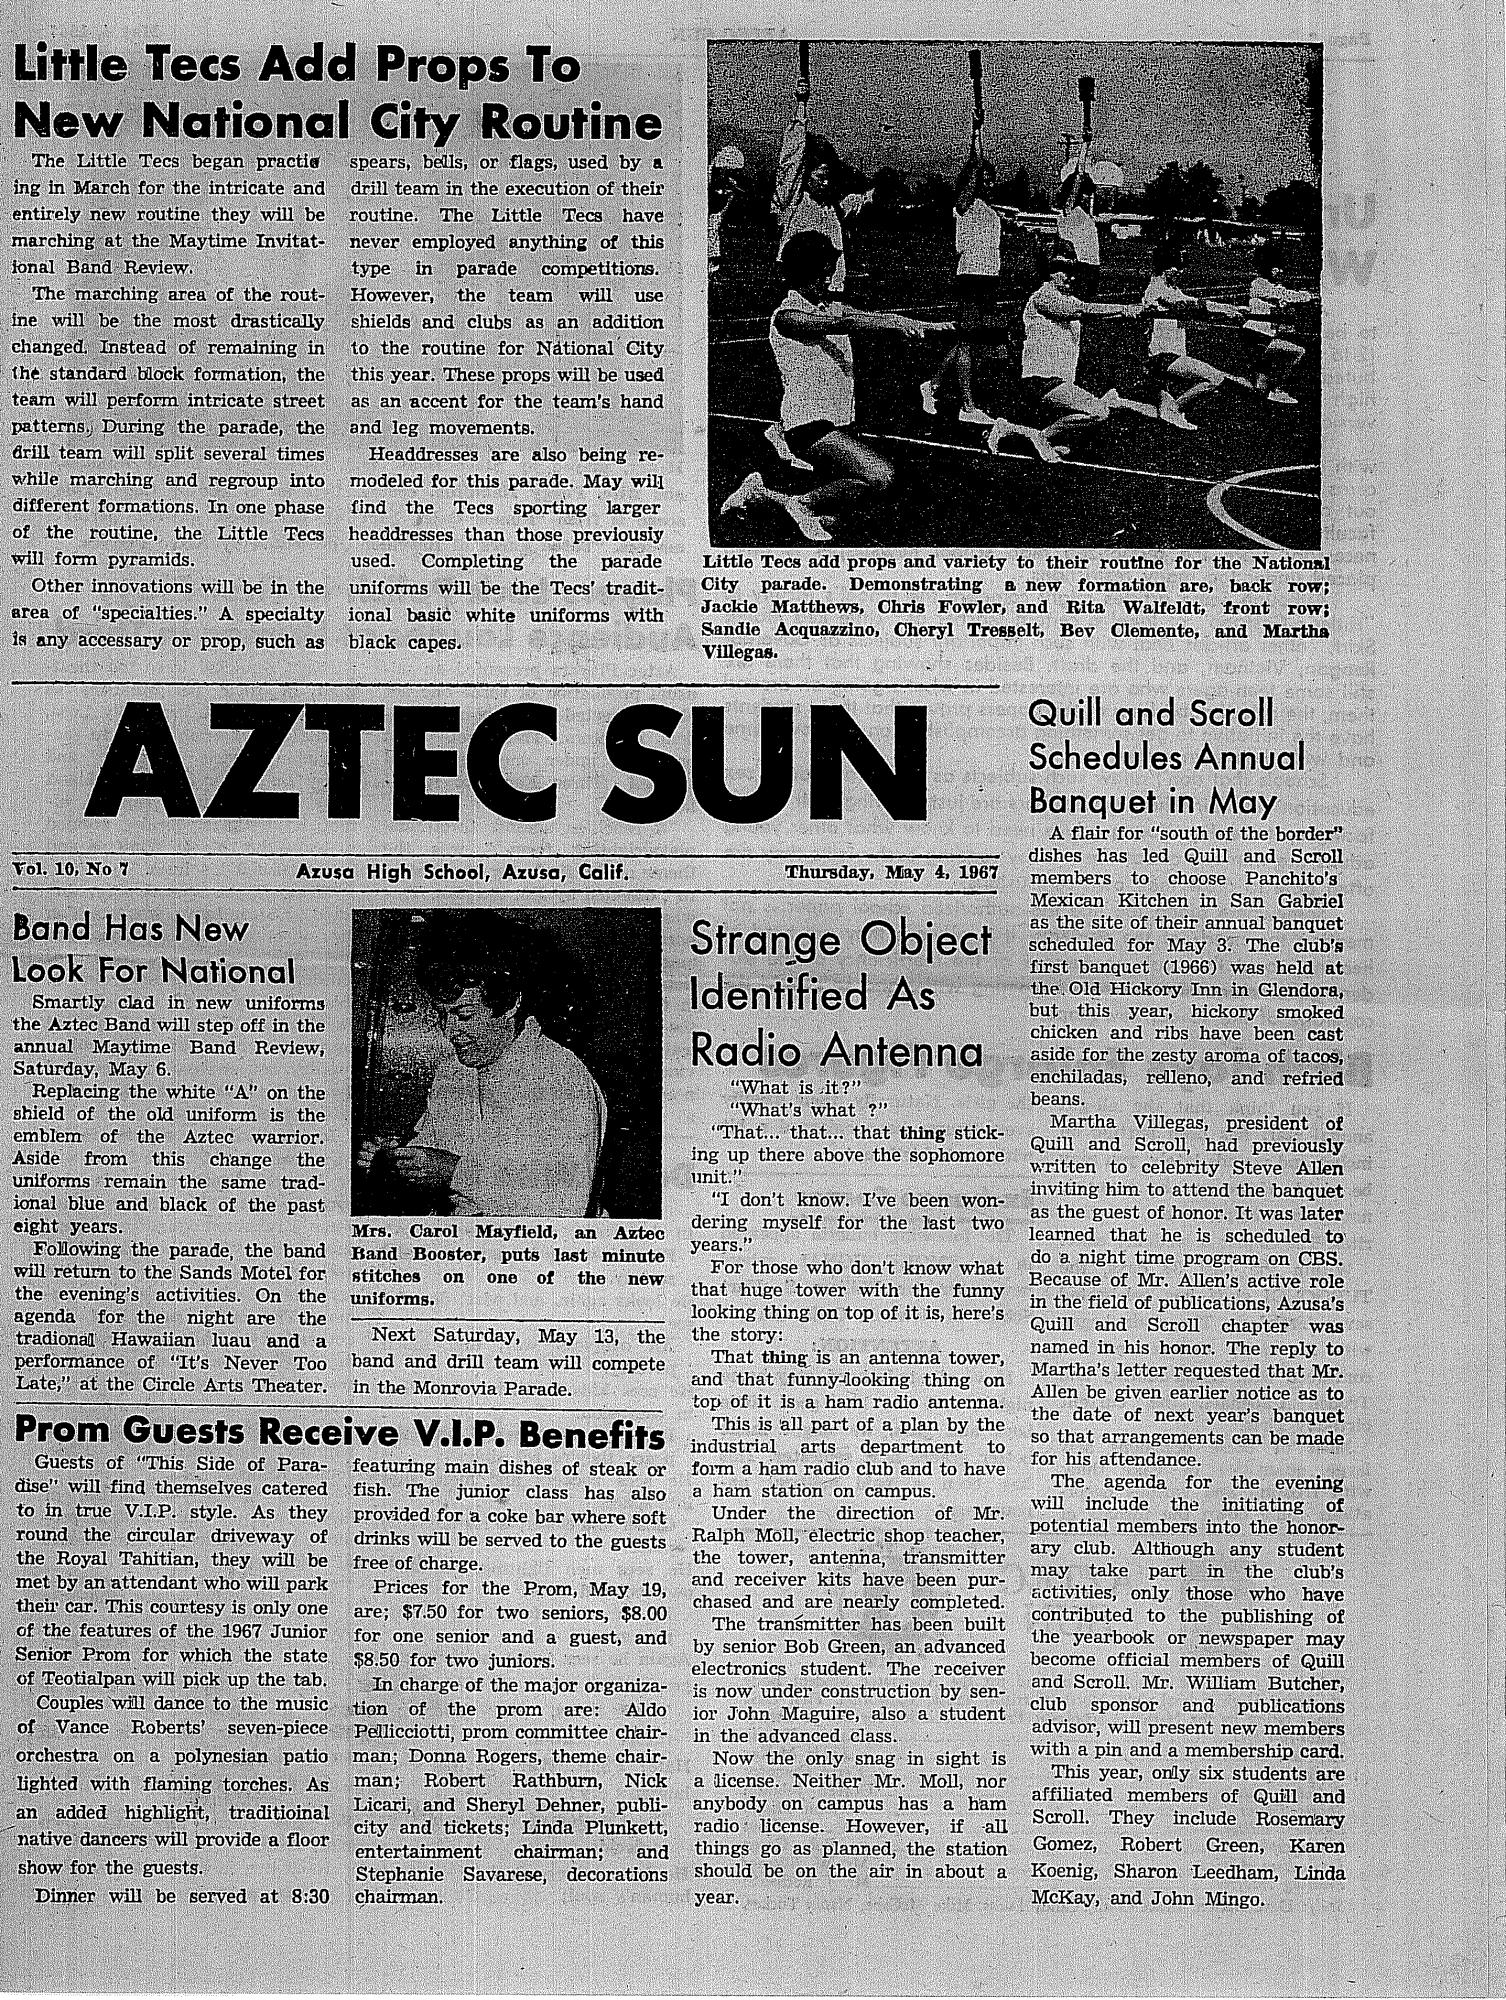 05-04-67 Aztec Sun